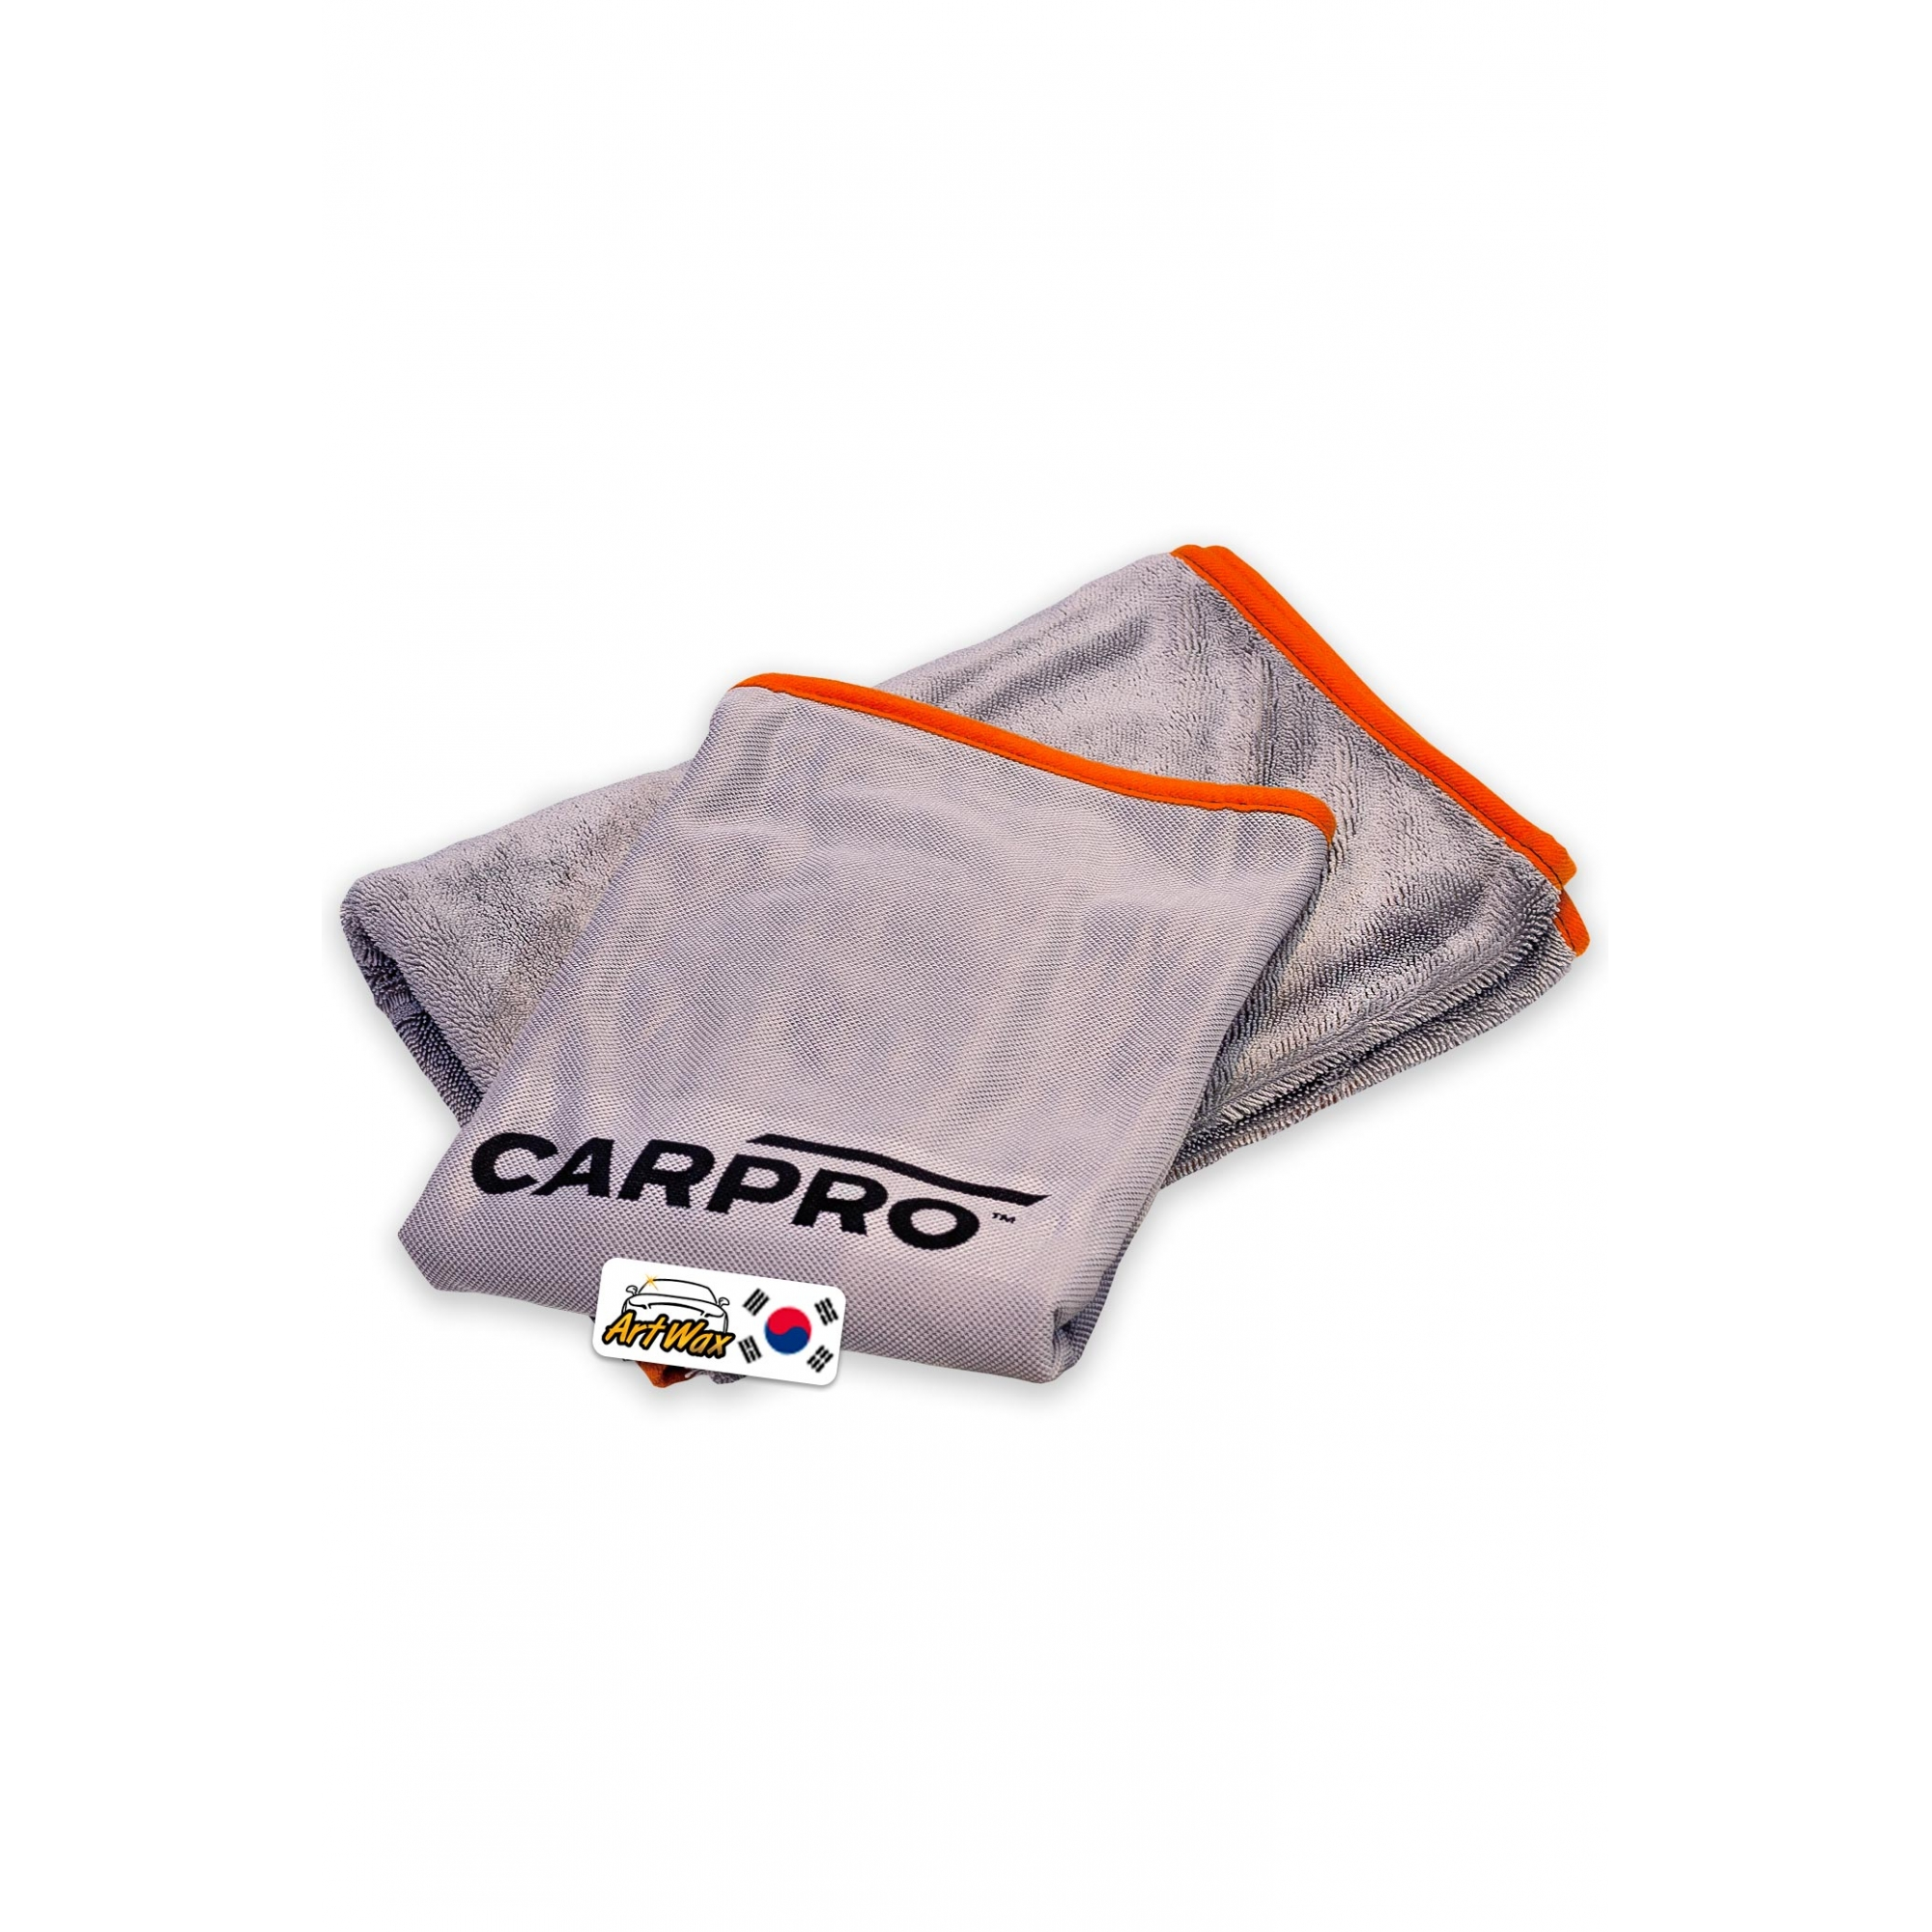 Carpro Dhydrate Toalha de Secagem Cinza 50x55cm 540gsm - 1un